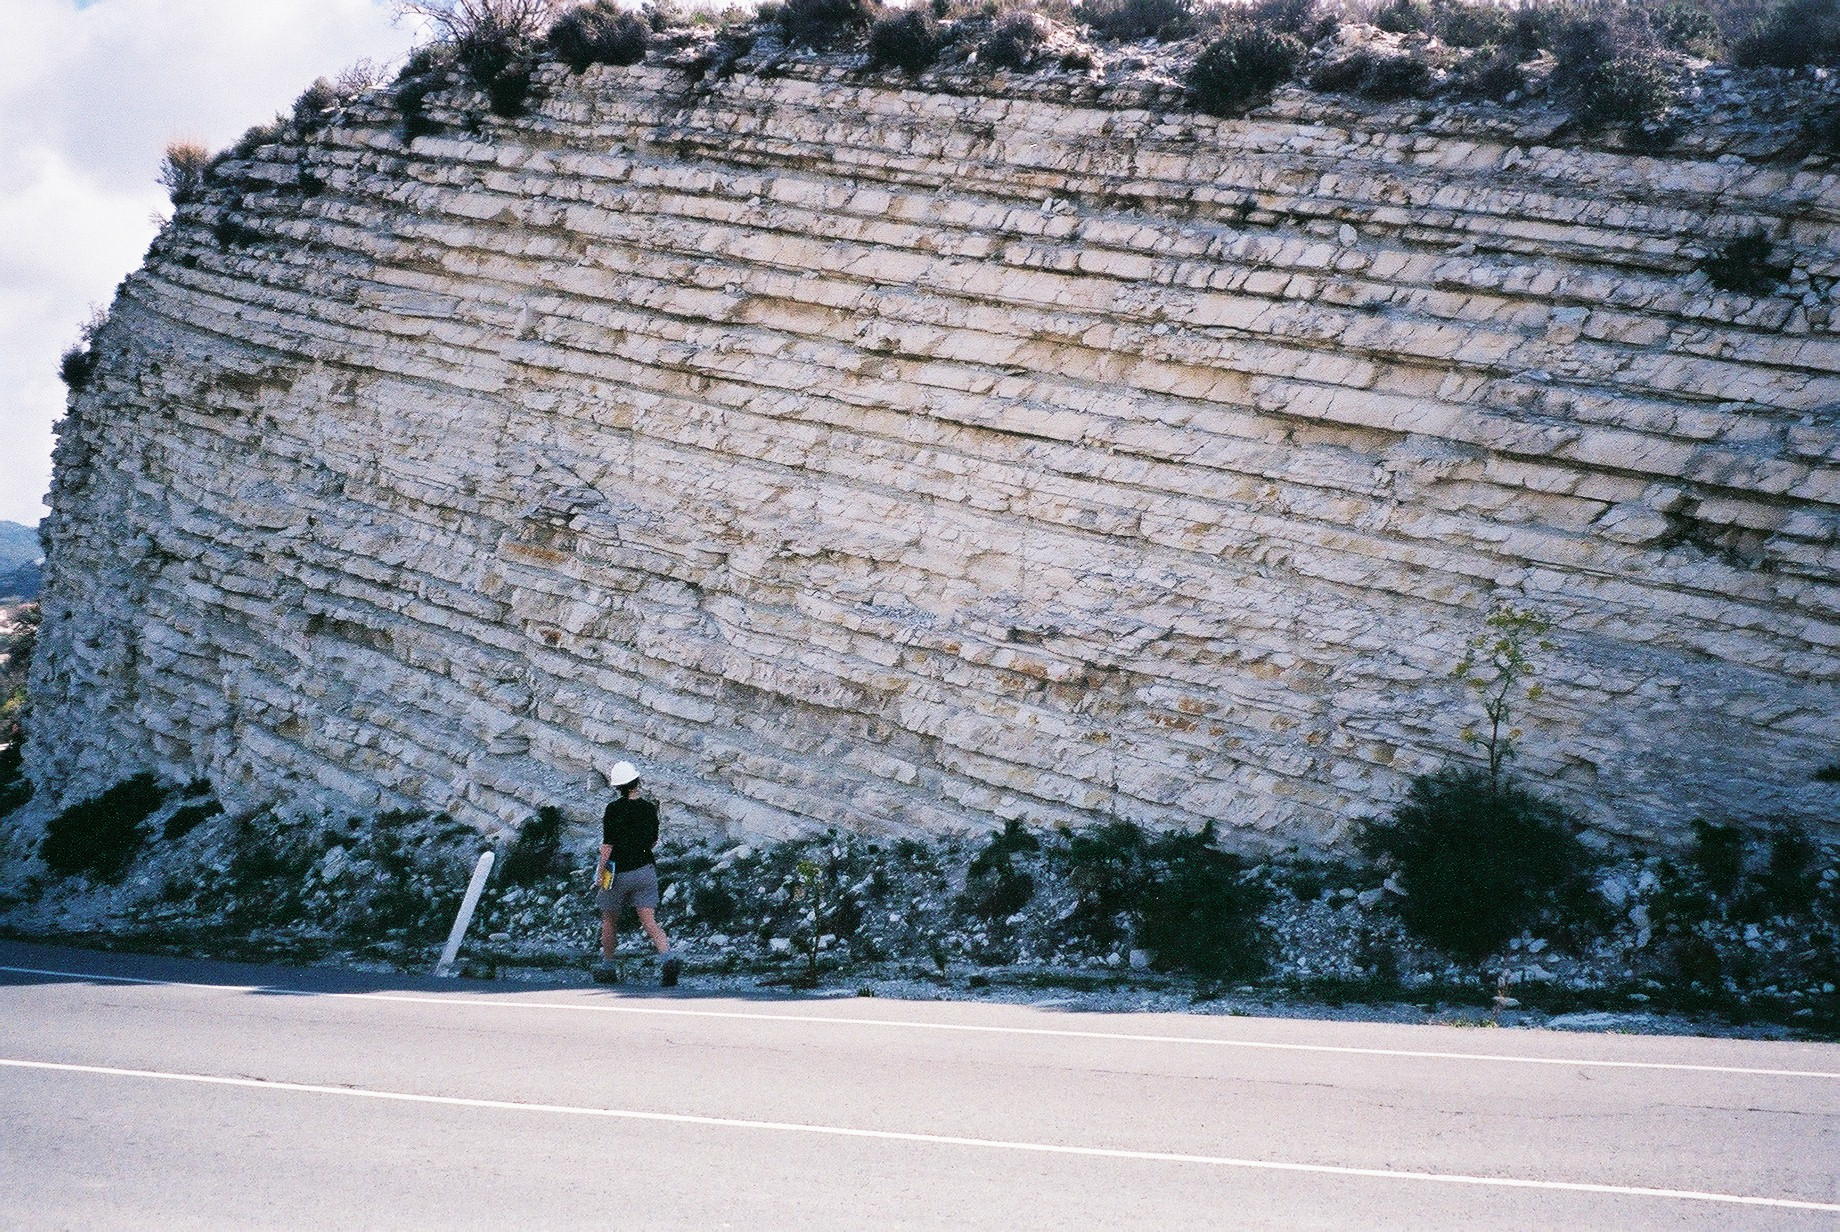 Rocks: Igneous, Metamorphic and Sedimentary